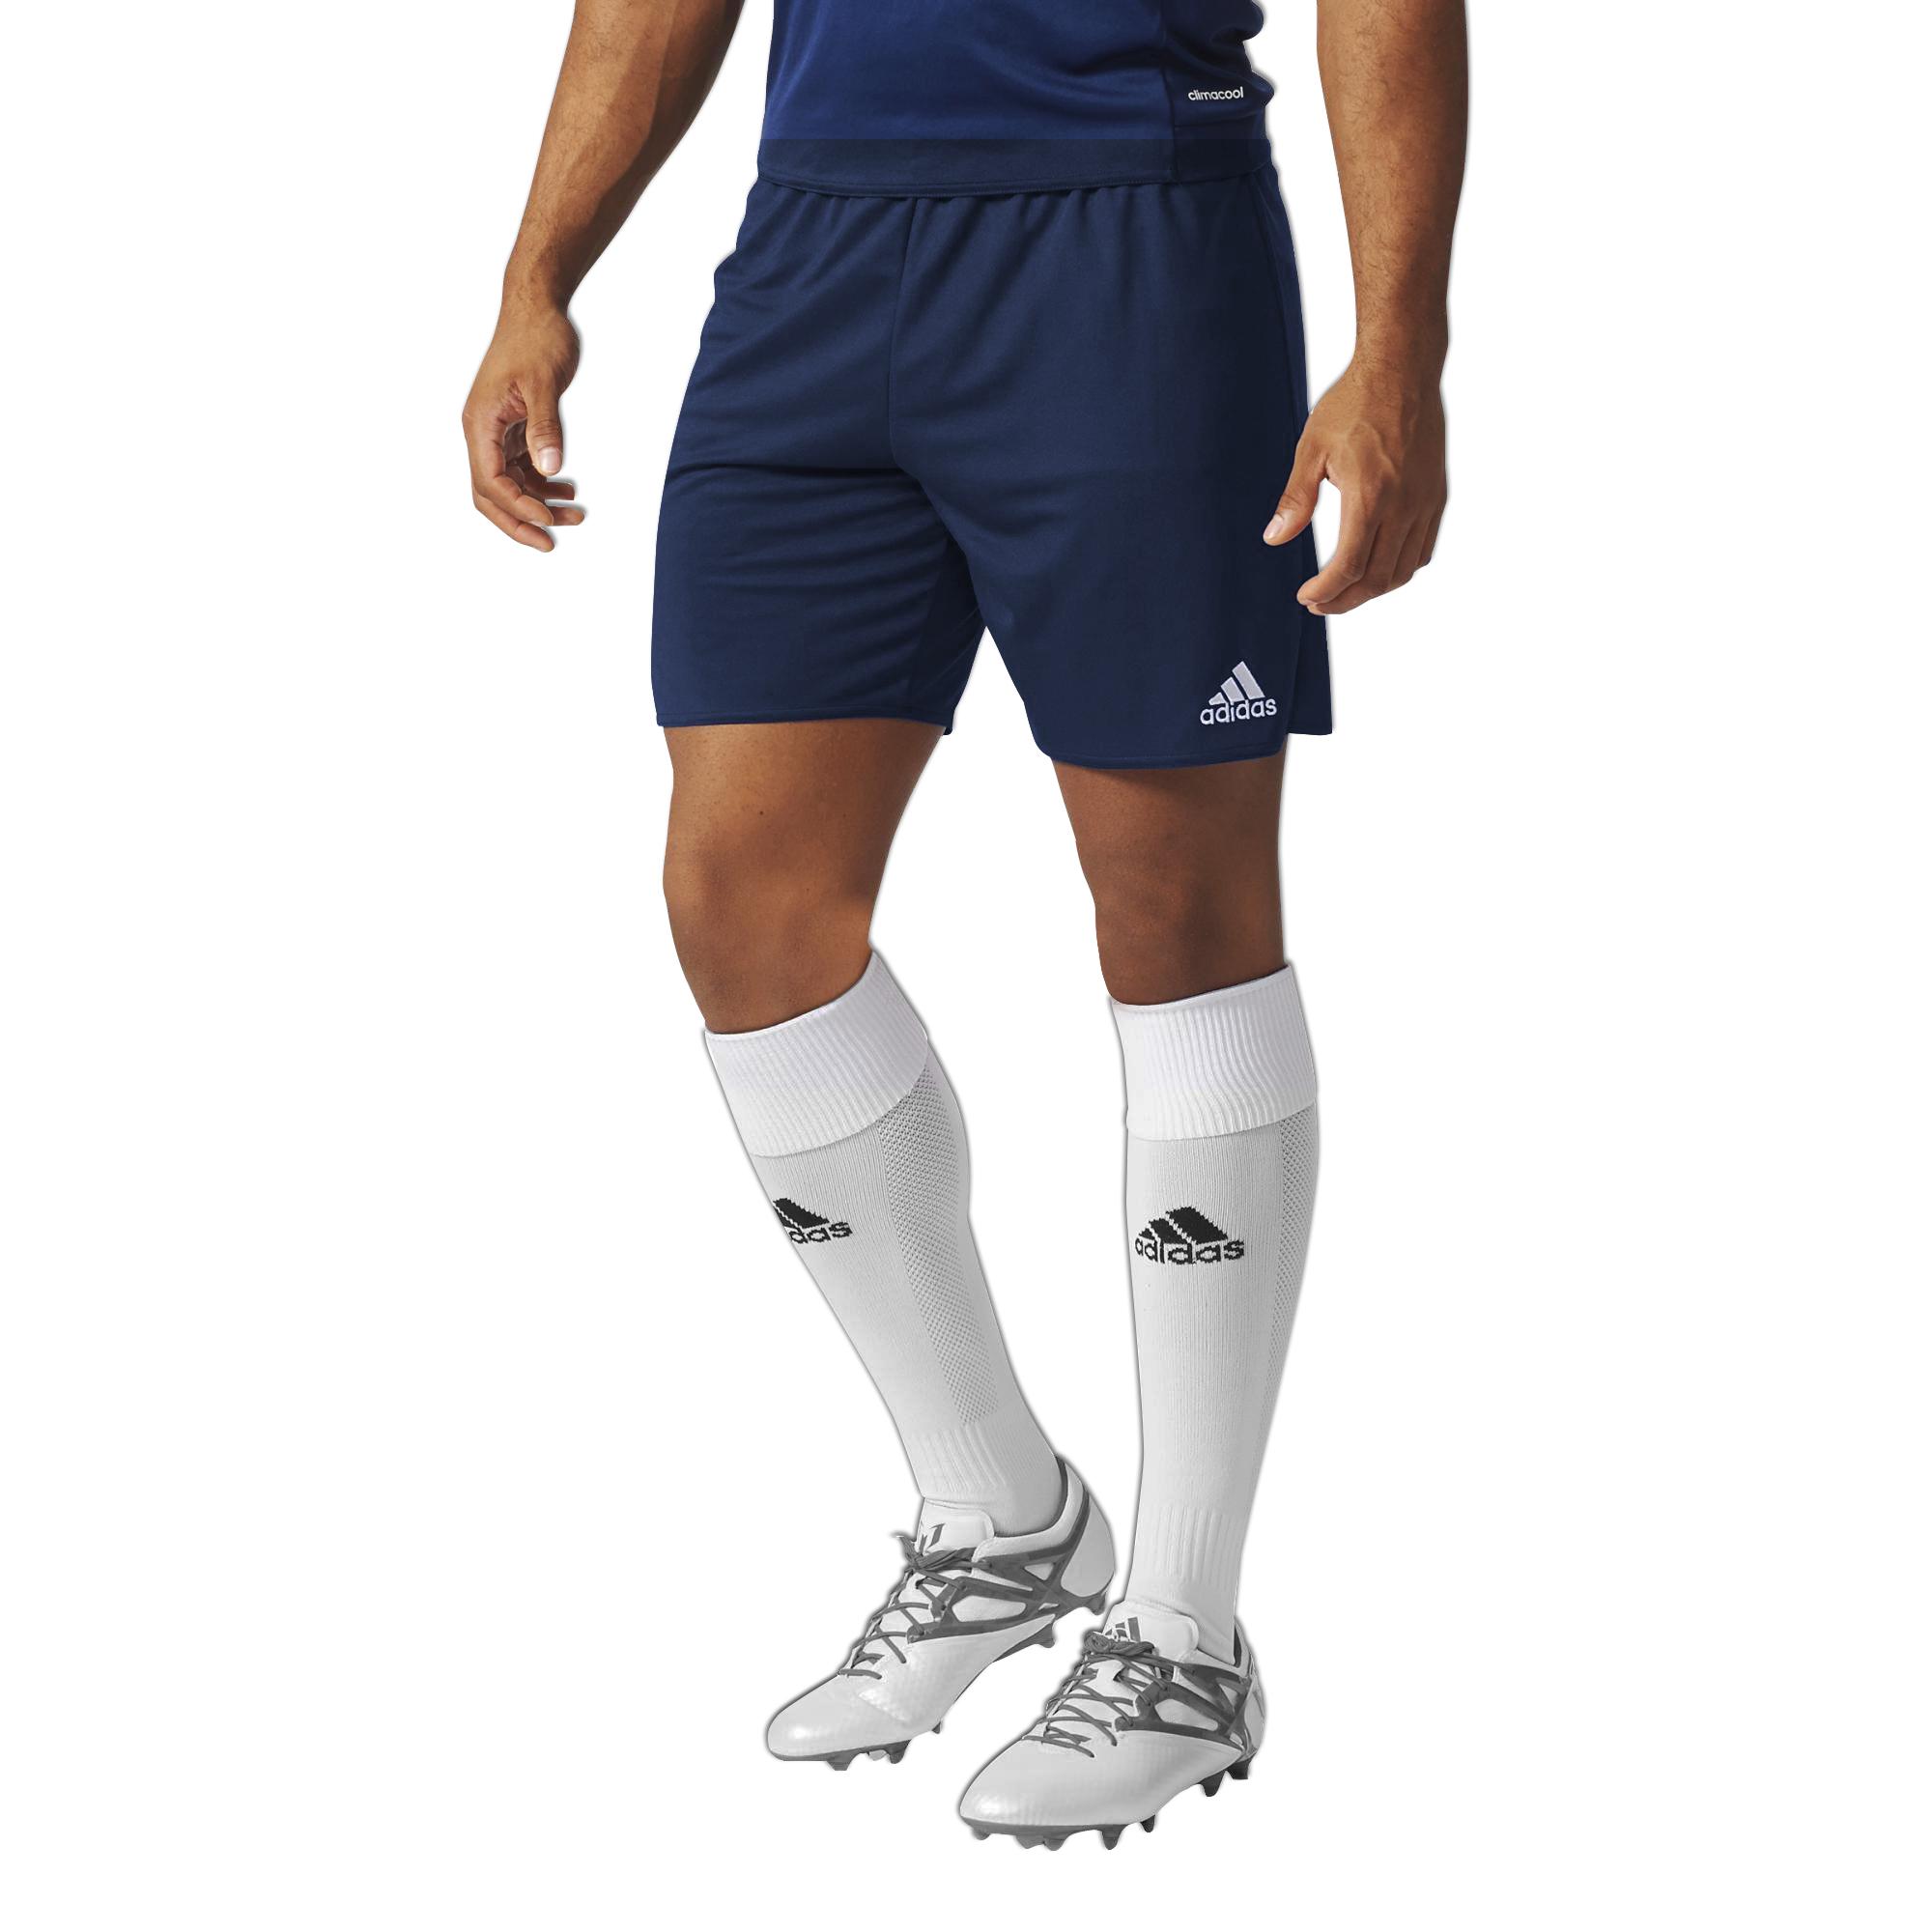 adidas-Men-039-s-Parma-Football-Training-Team-Wear-Shorts-Sport-Casual-Gym-B-Grade thumbnail 4